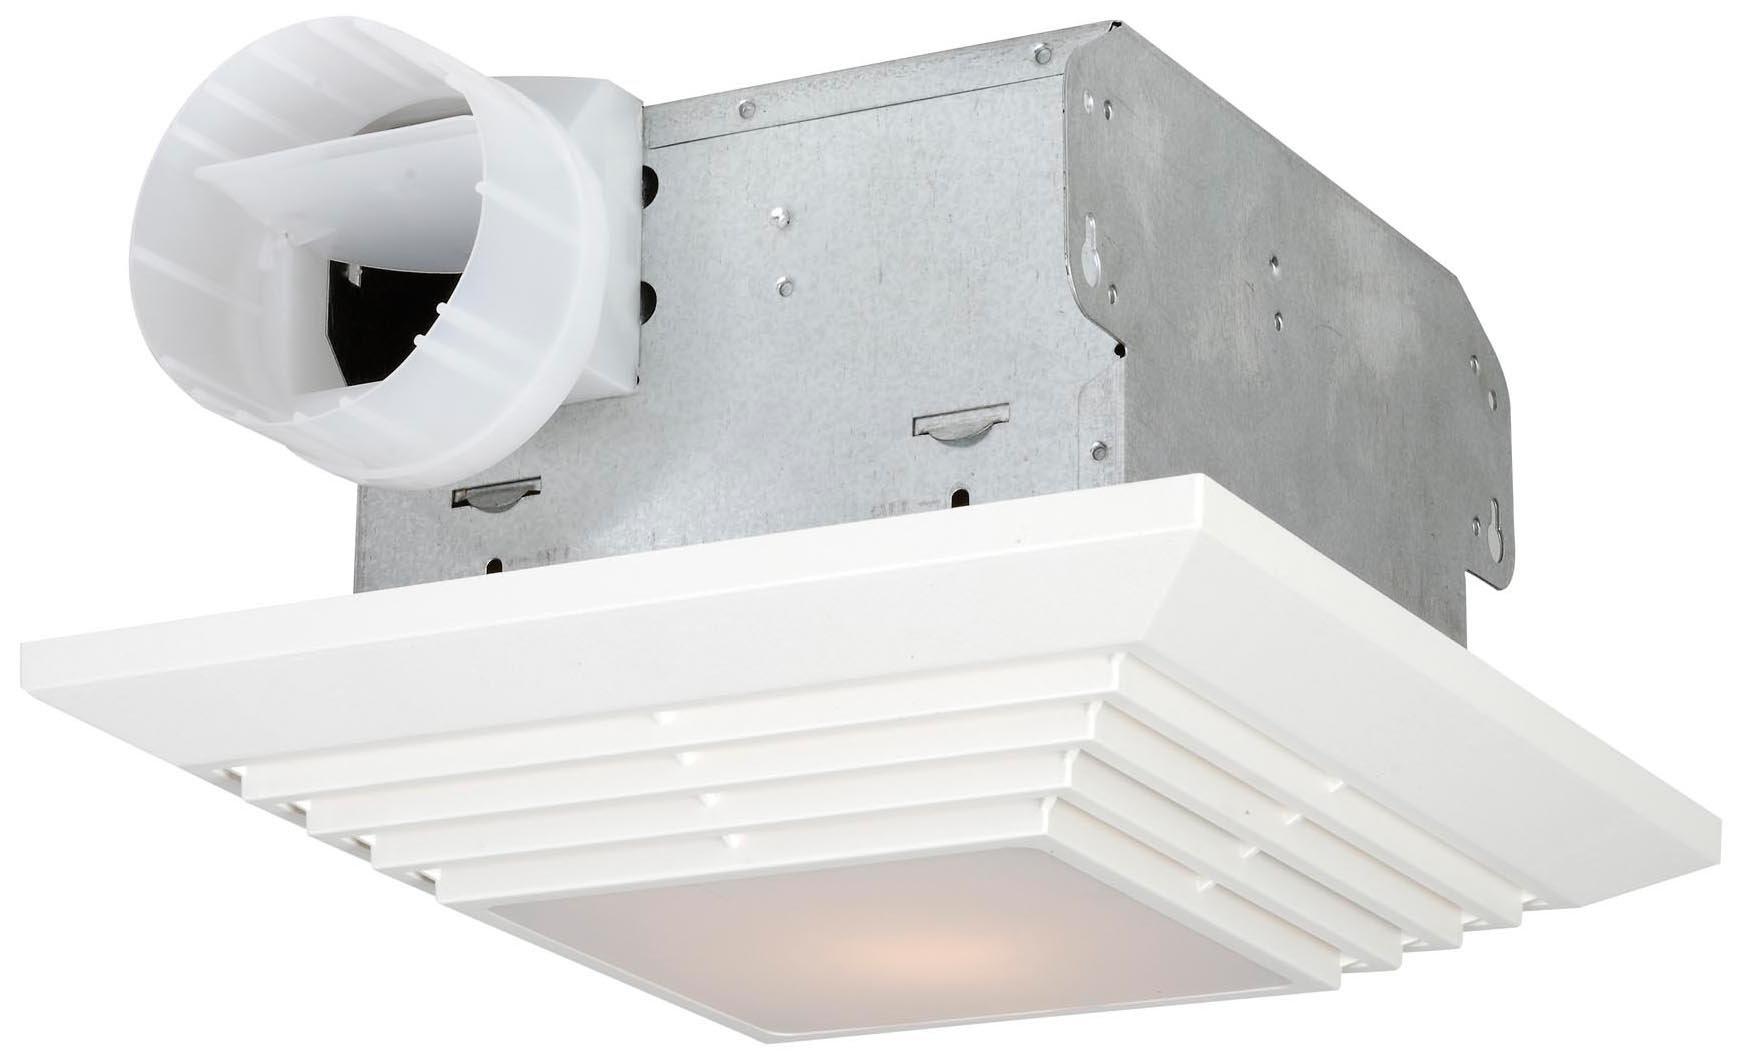 Craftmade TFV90L Ventilation Bathroom Exhaust Fan